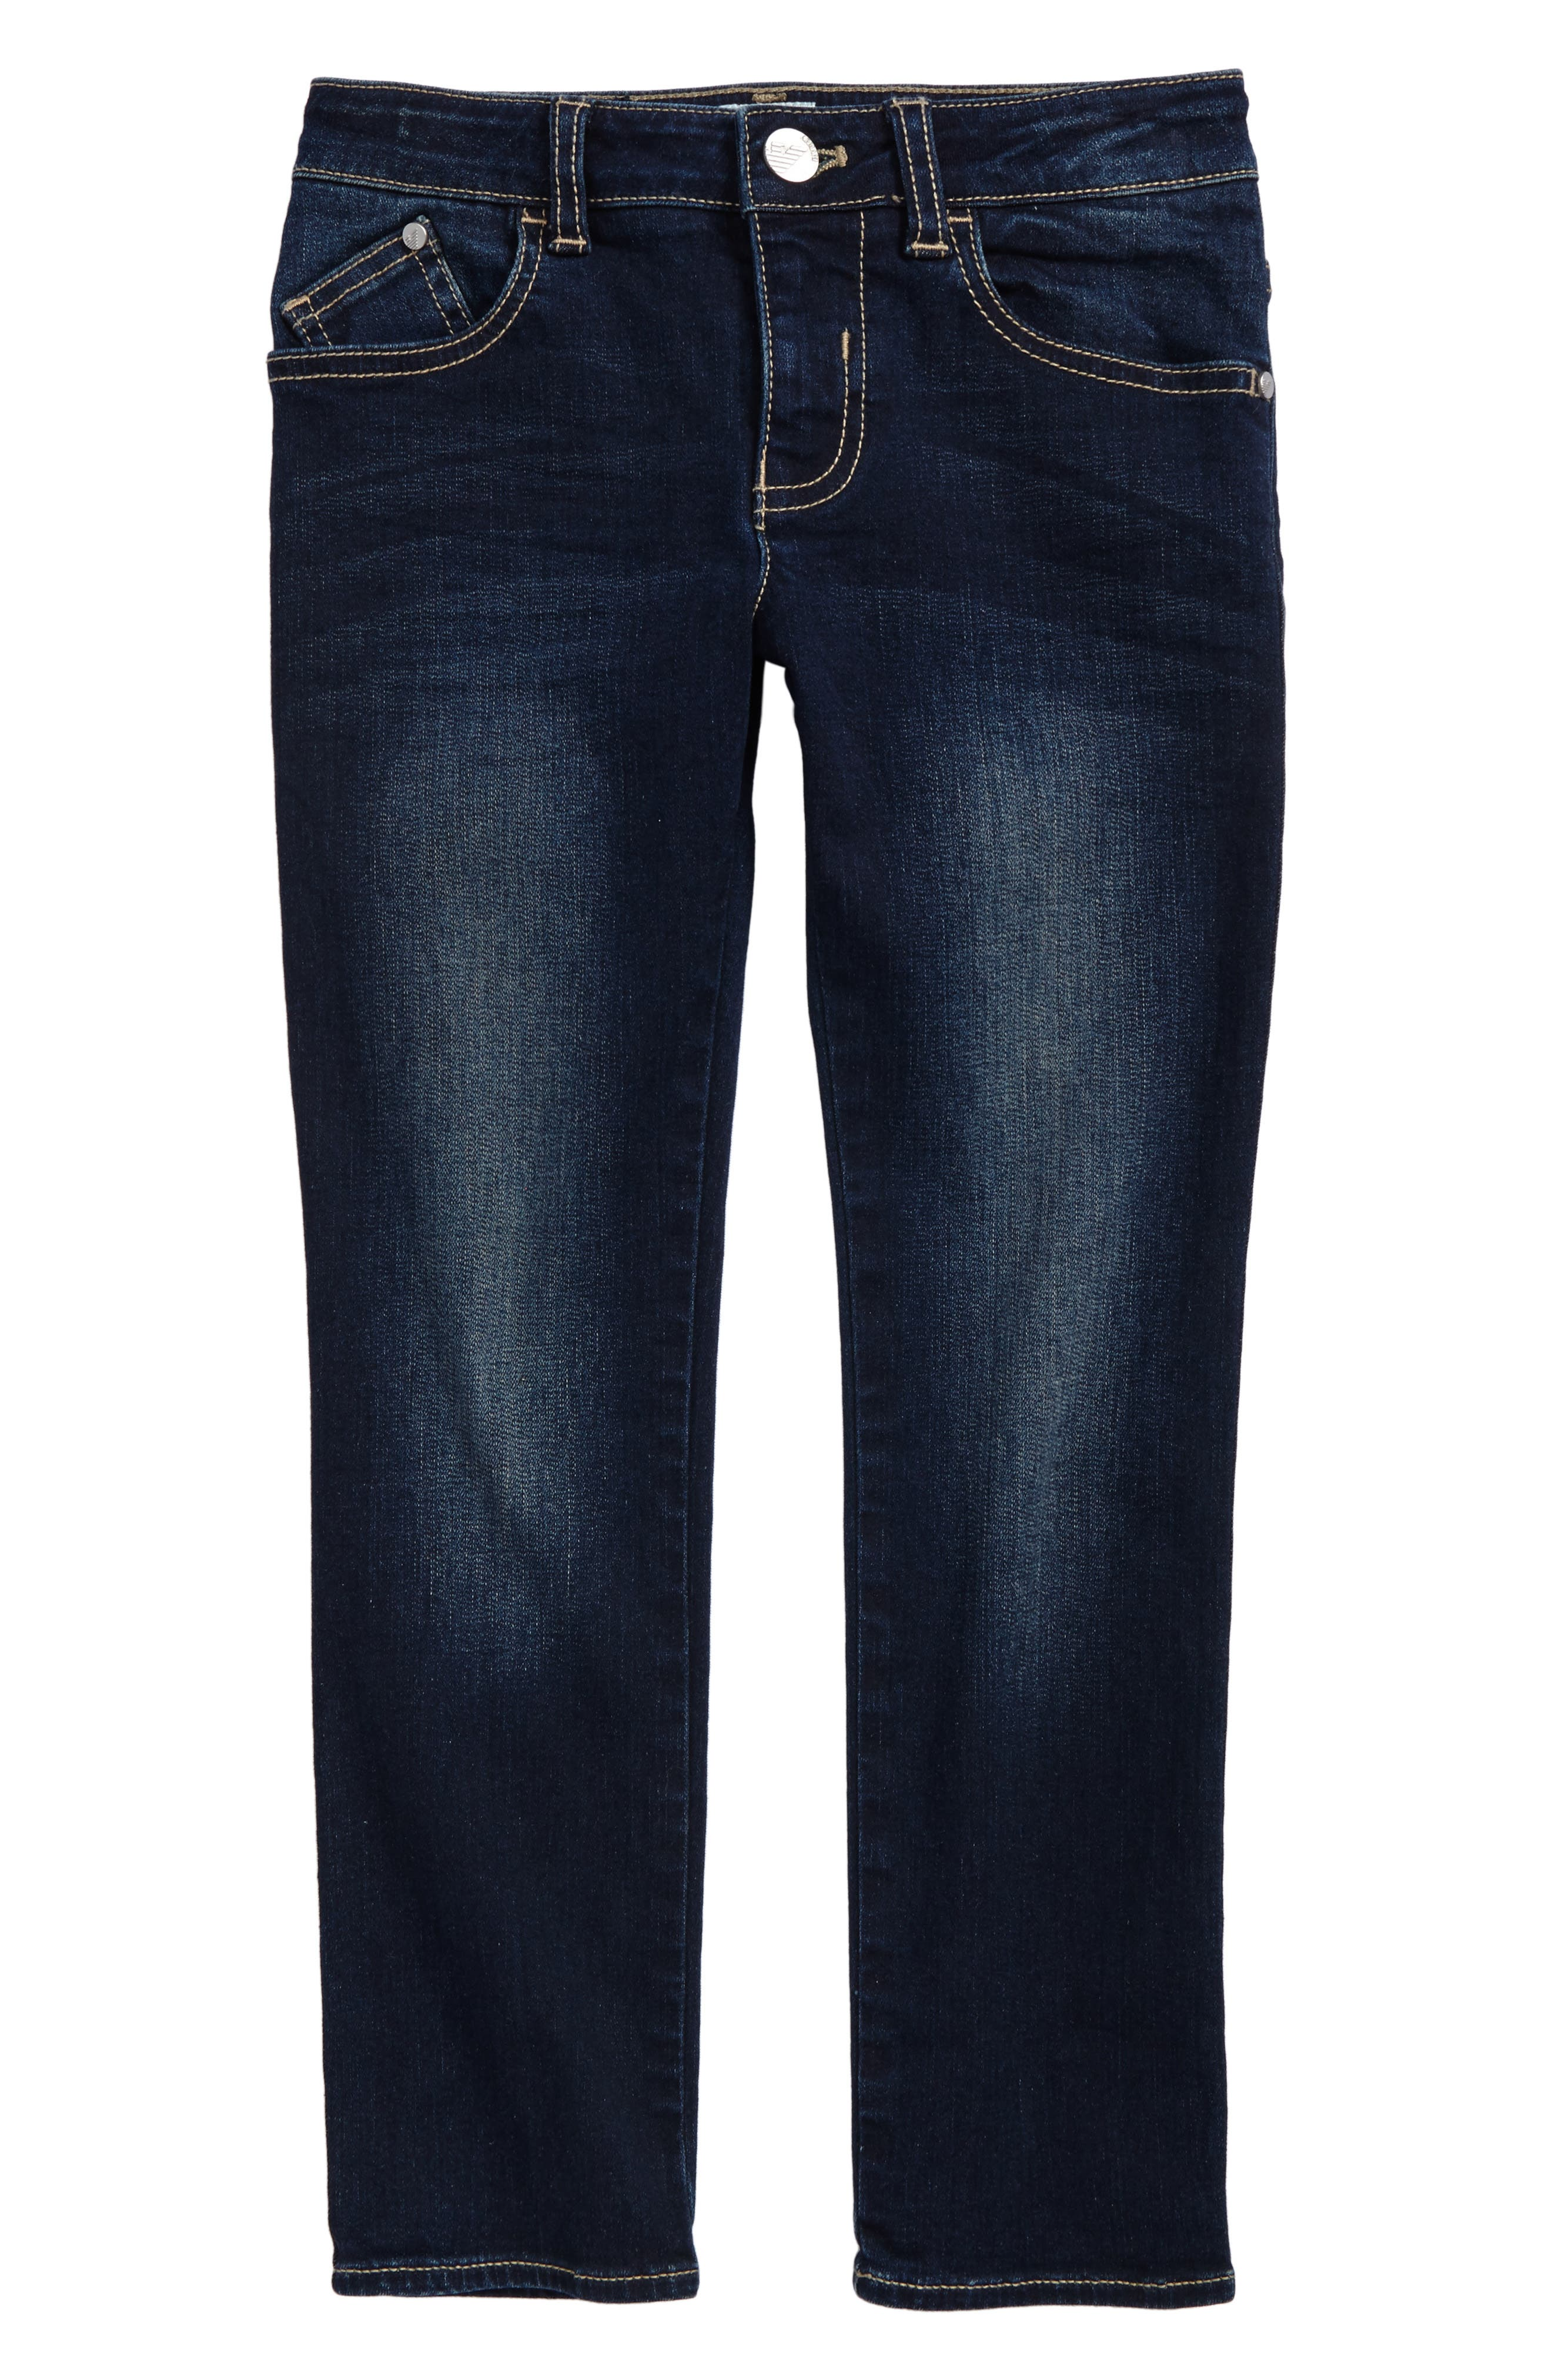 Straight Leg Jeans,                         Main,                         color, 424